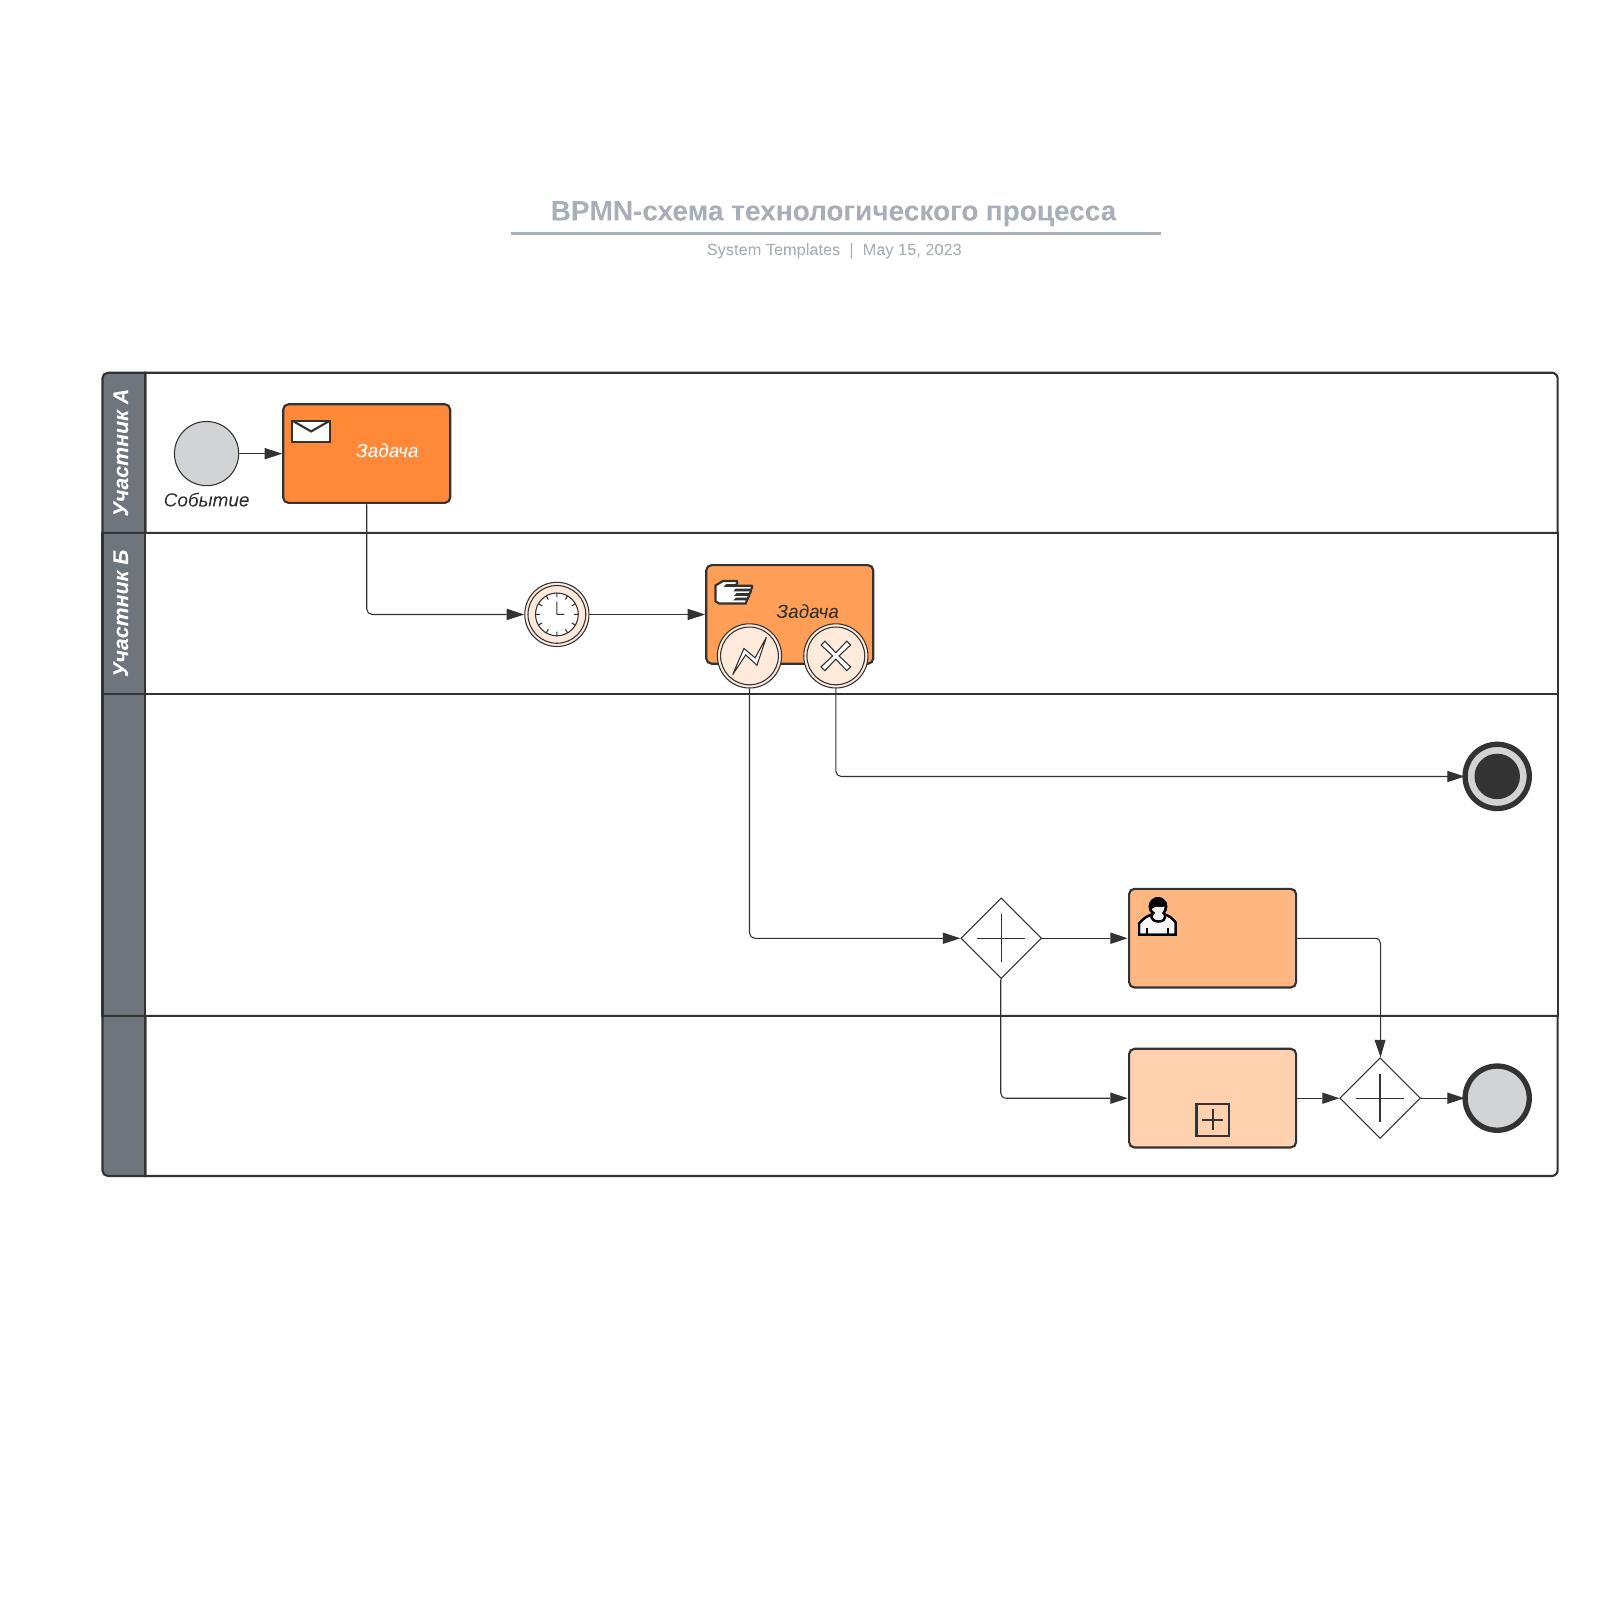 BPMN-схема технологического процесса